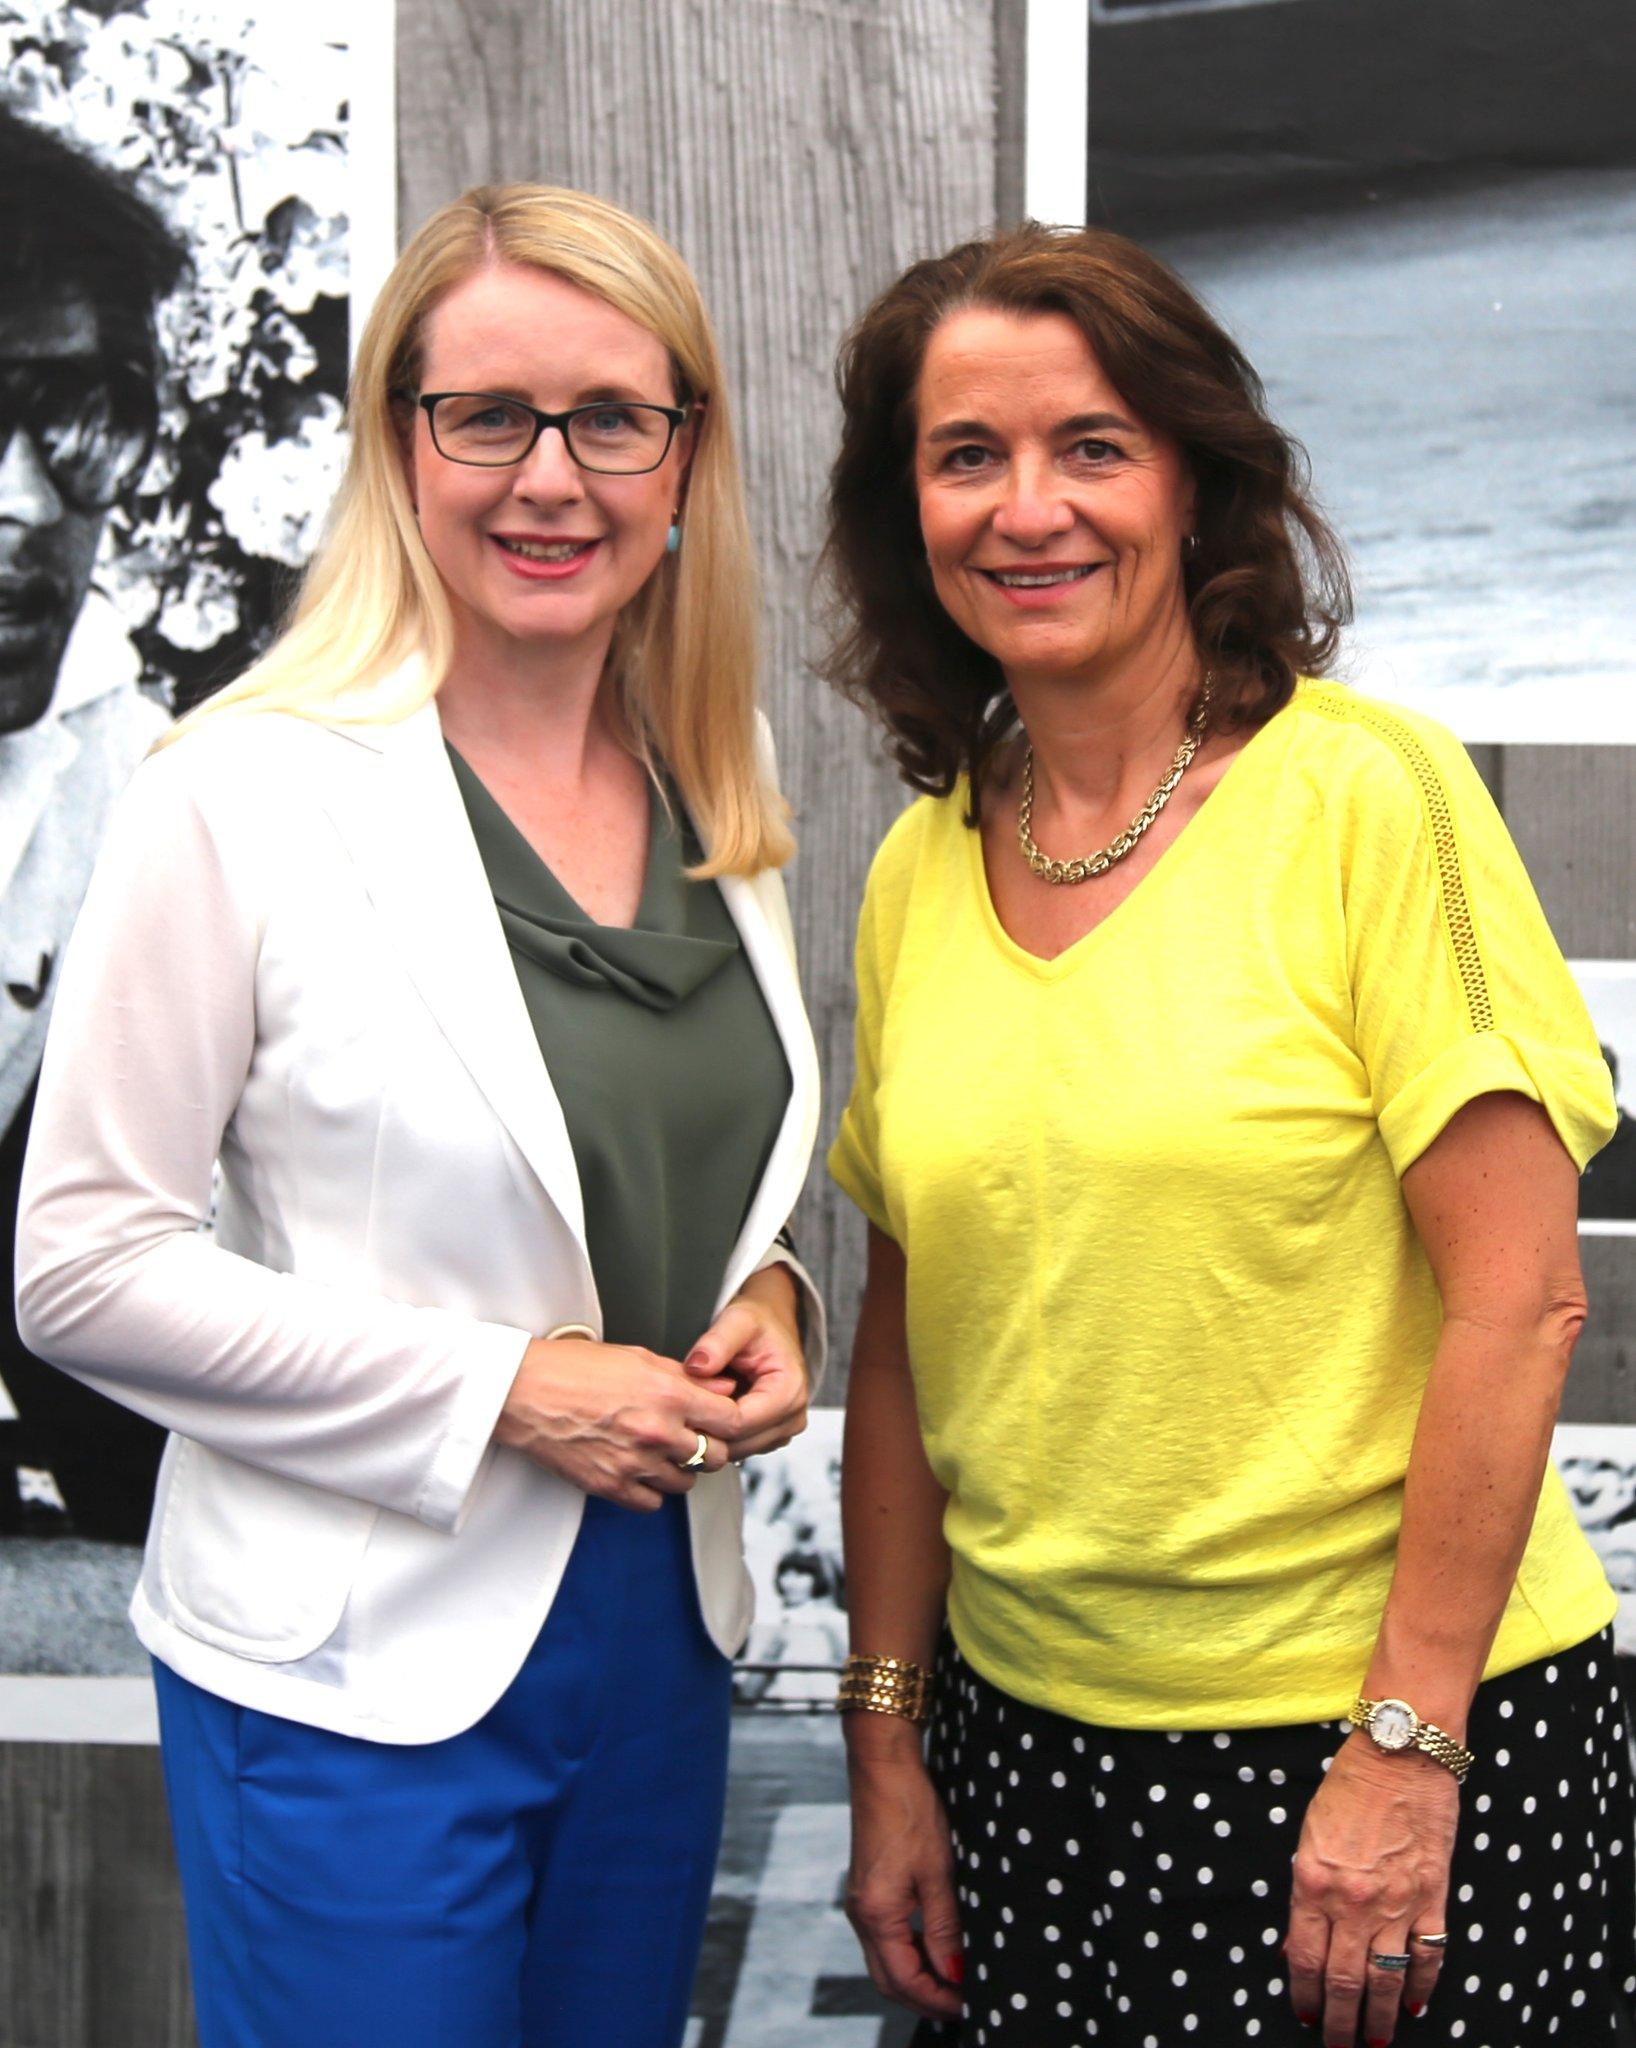 Frauen in Kitzbhel - Thema auf optical-mark-recognition.com